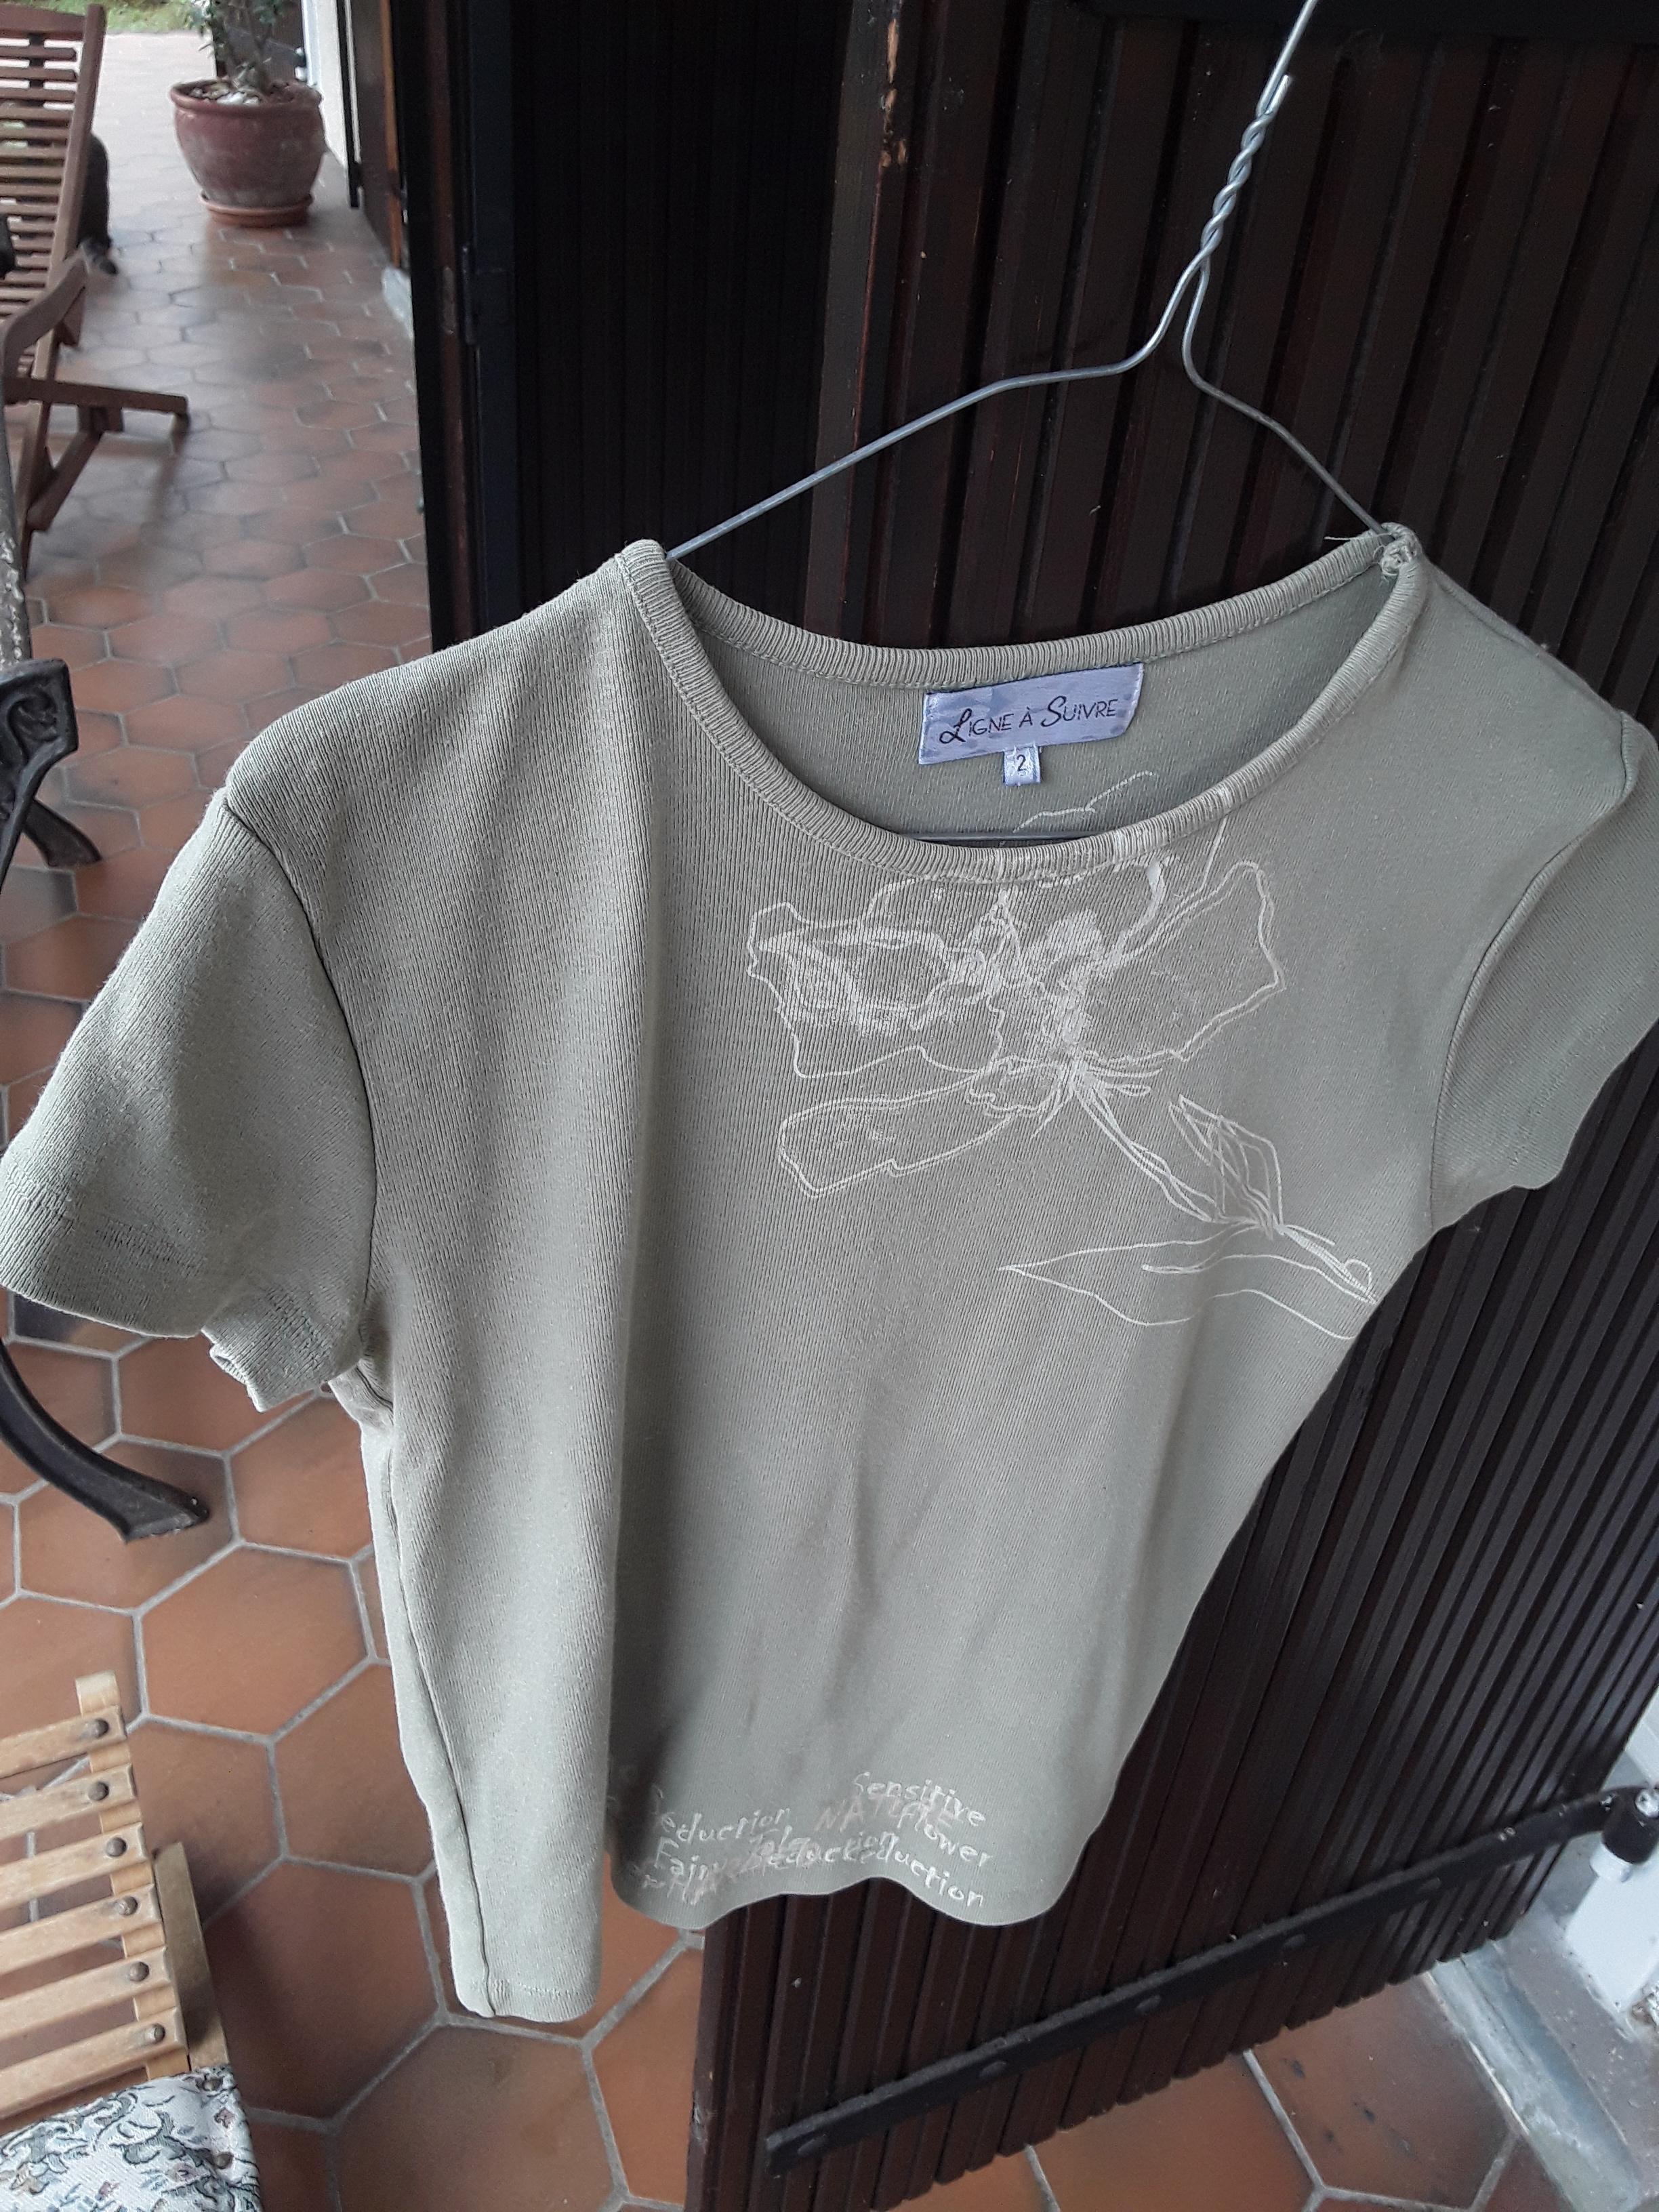 troc de troc tee shirt t 2 image 0